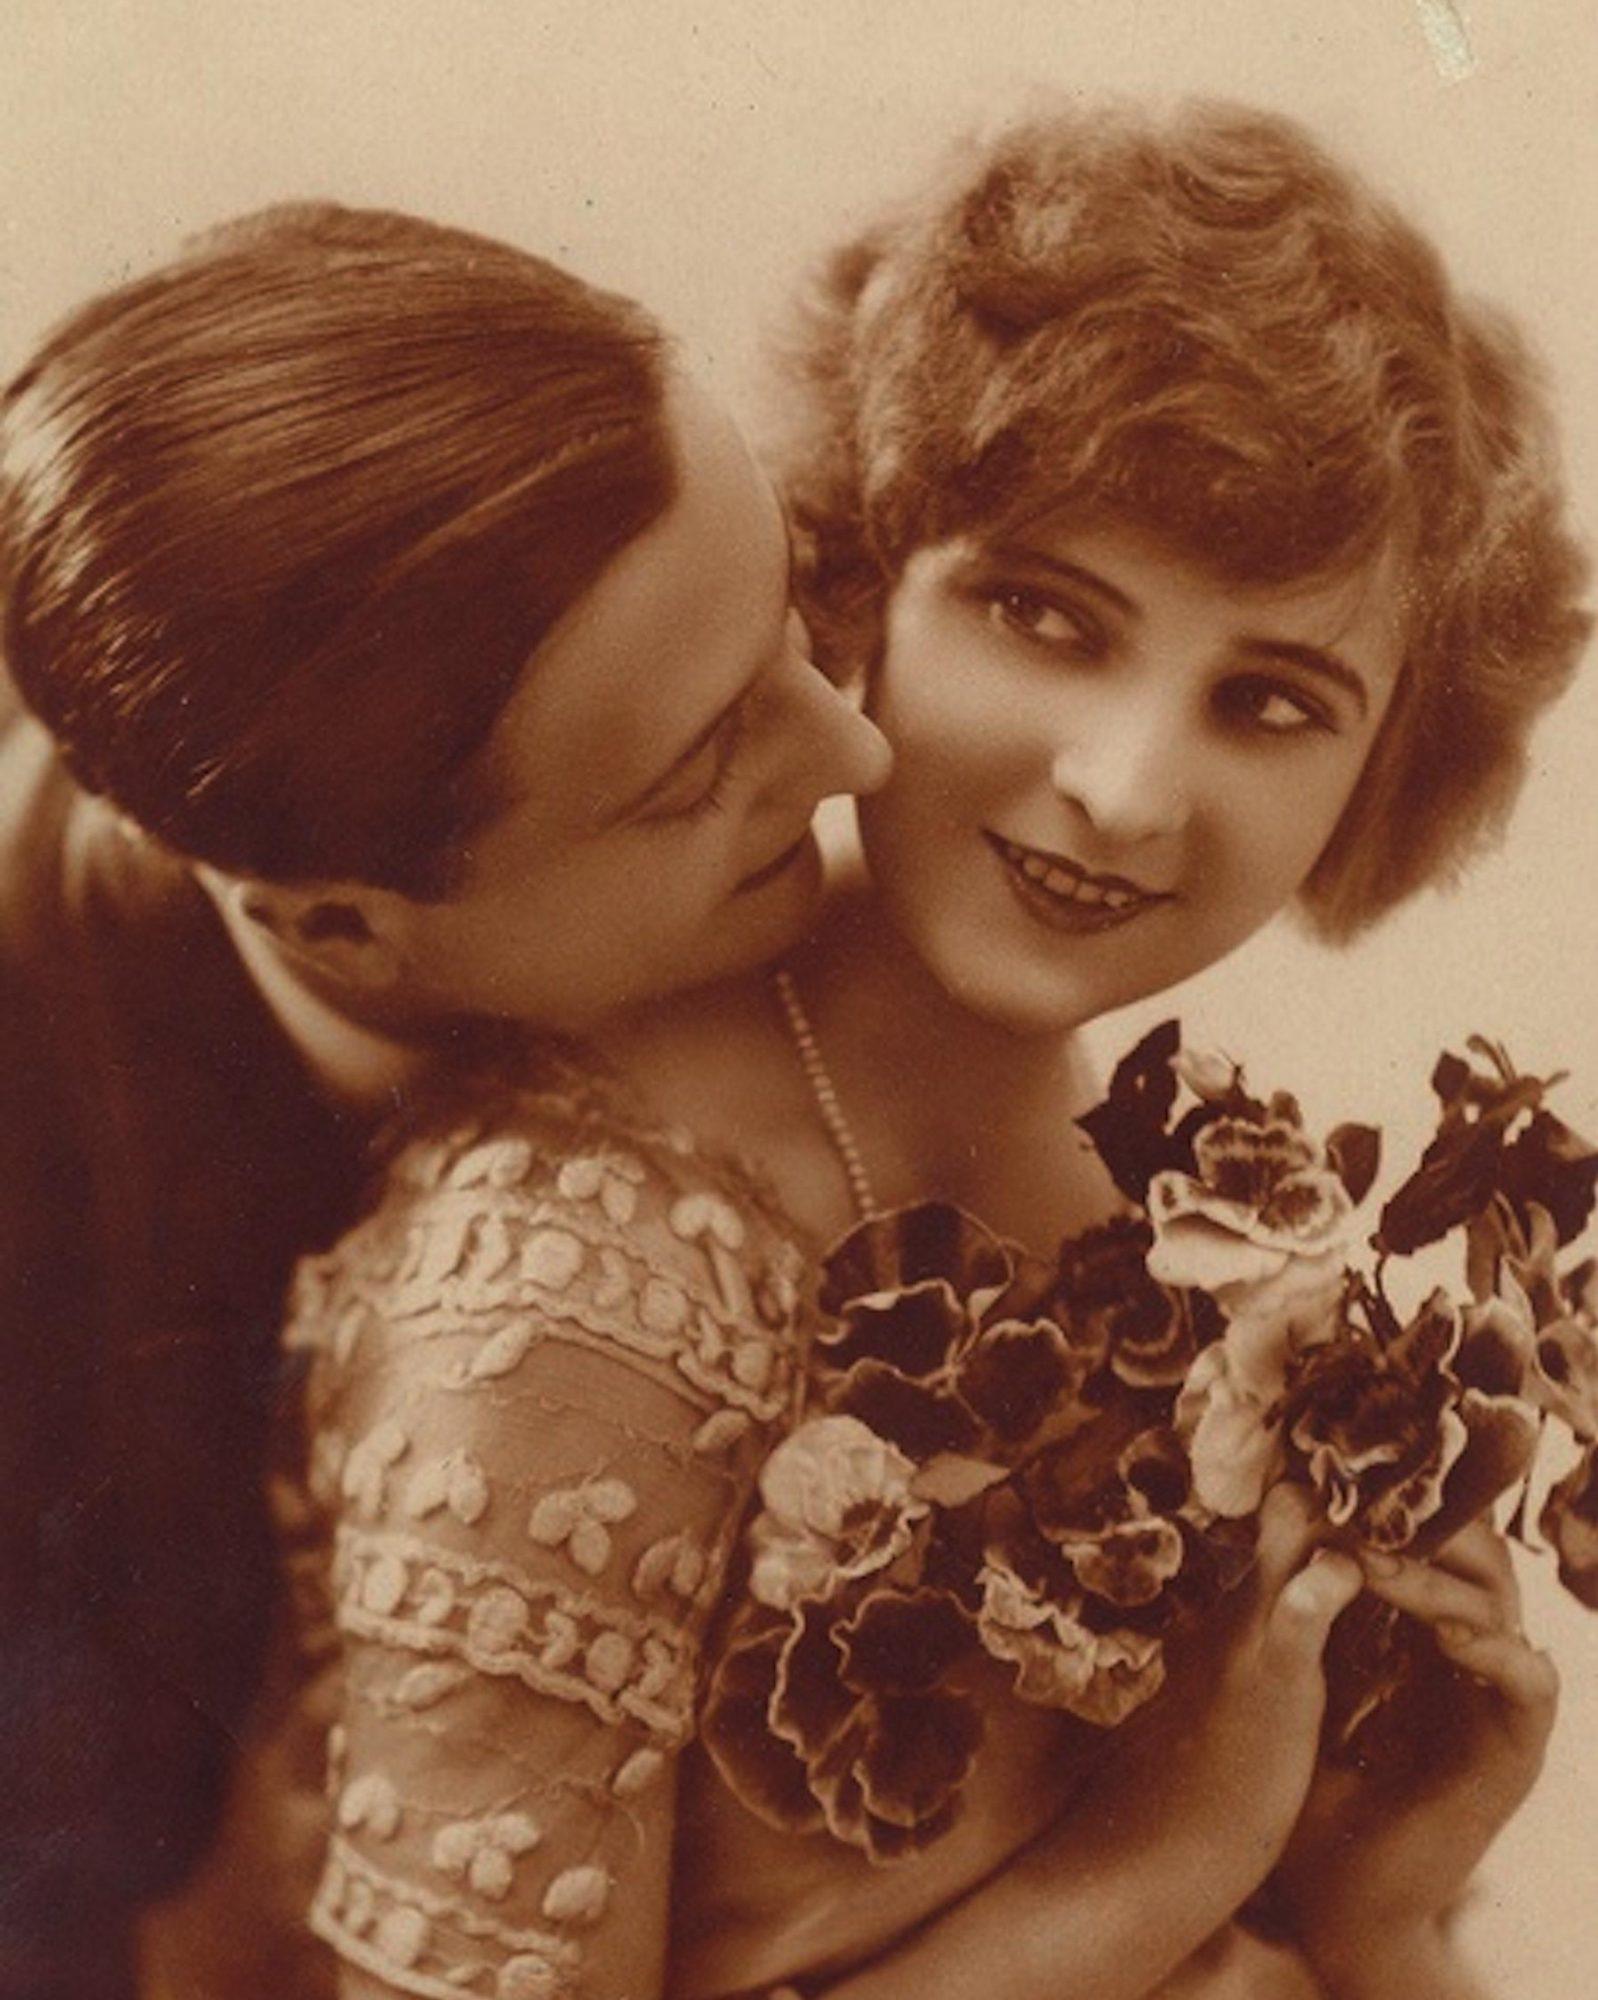 F. Scott Fitzgerald and Zelda Sayre on their wedding day.